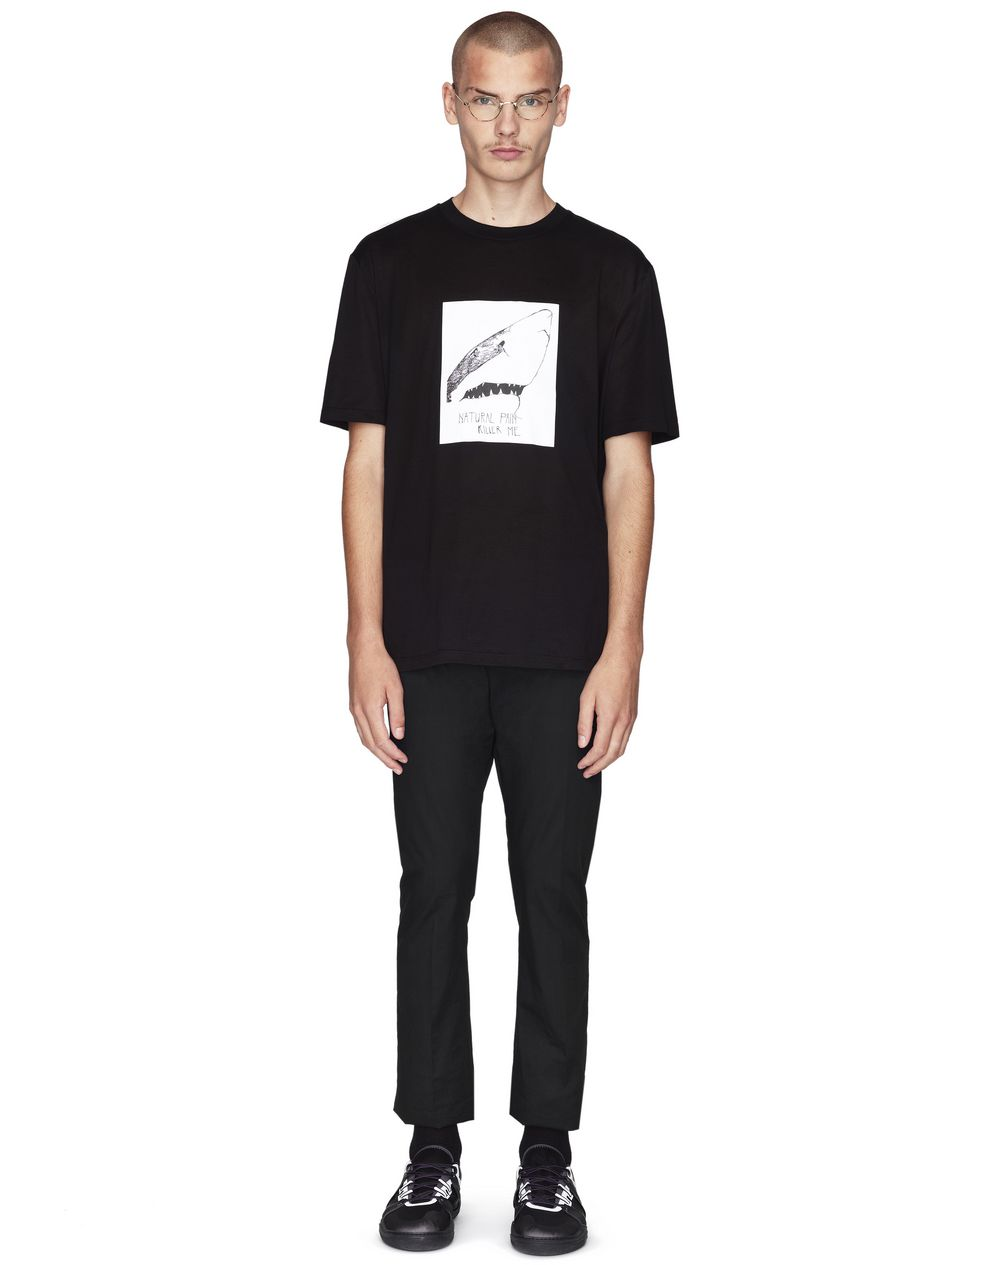 BLACK PRINT T-SHIRT  - Lanvin